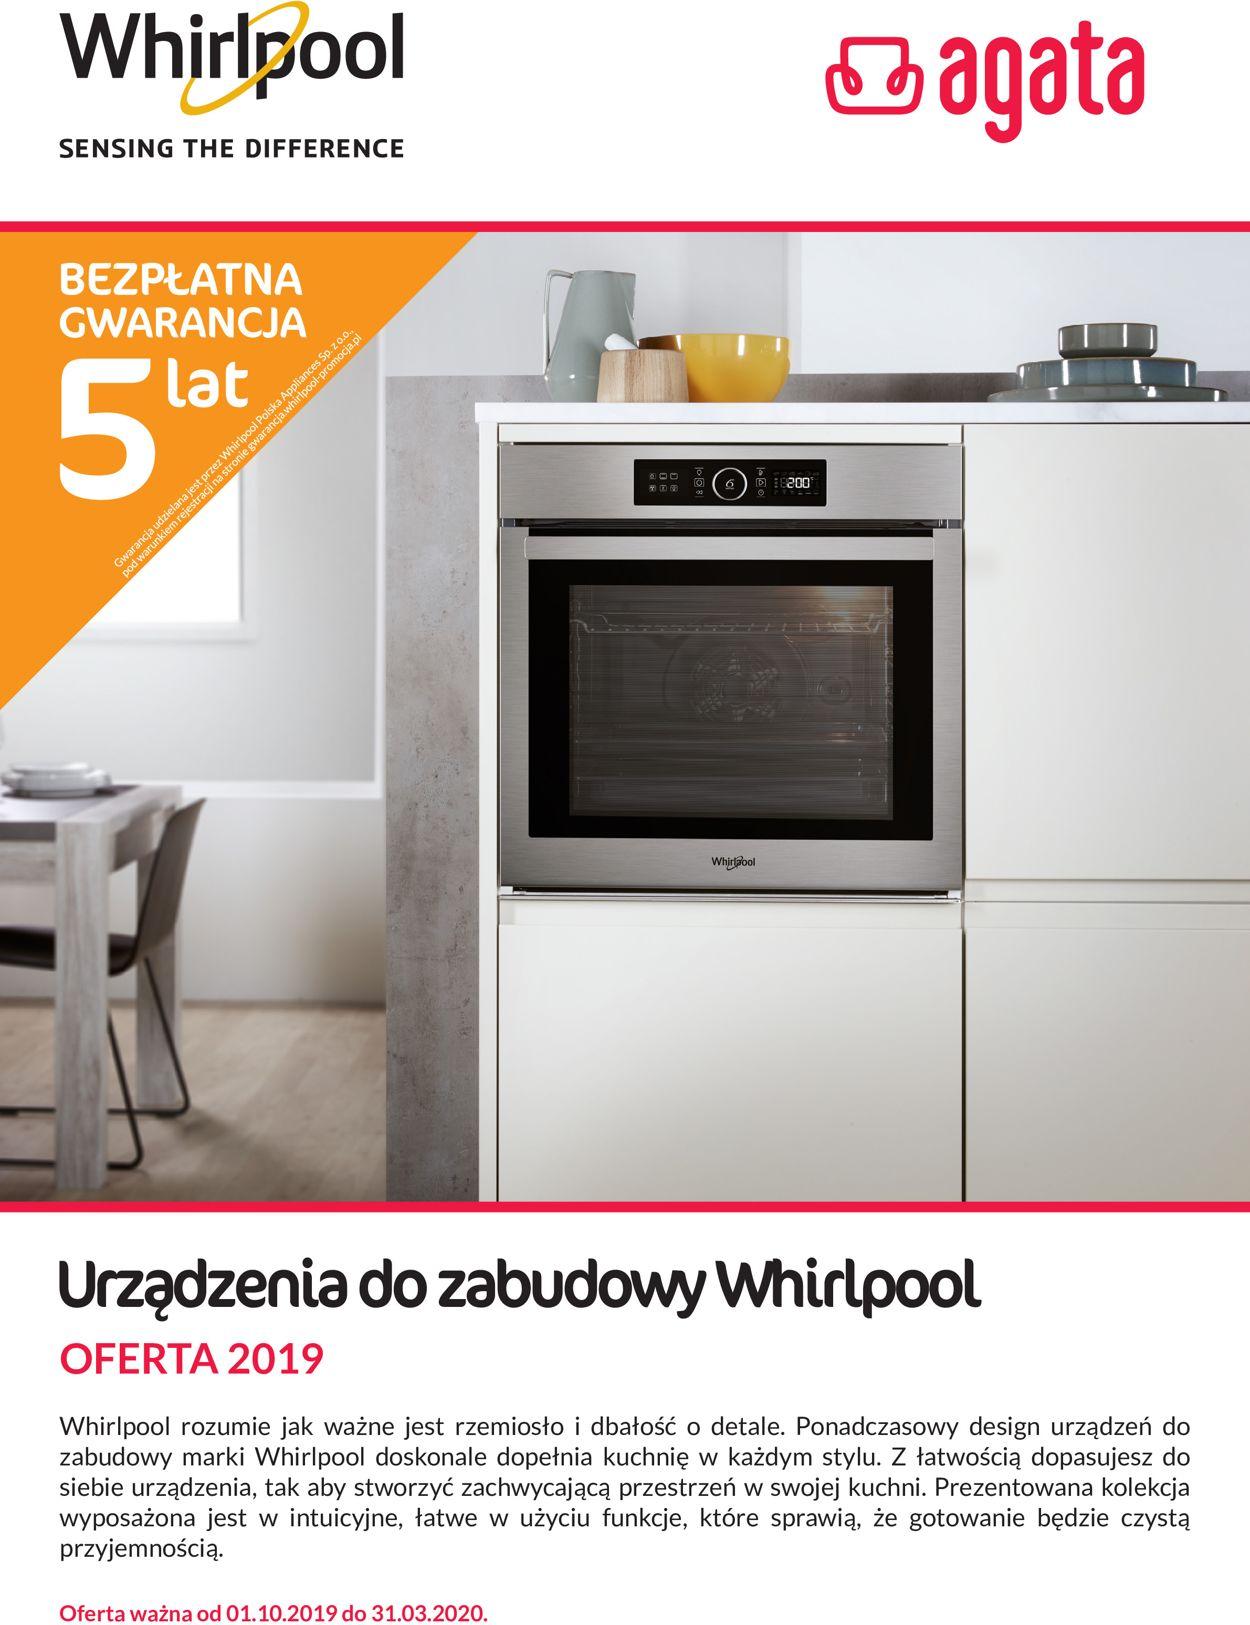 Gazetka promocyjna Agata Meble - 01.10-31.03.2020